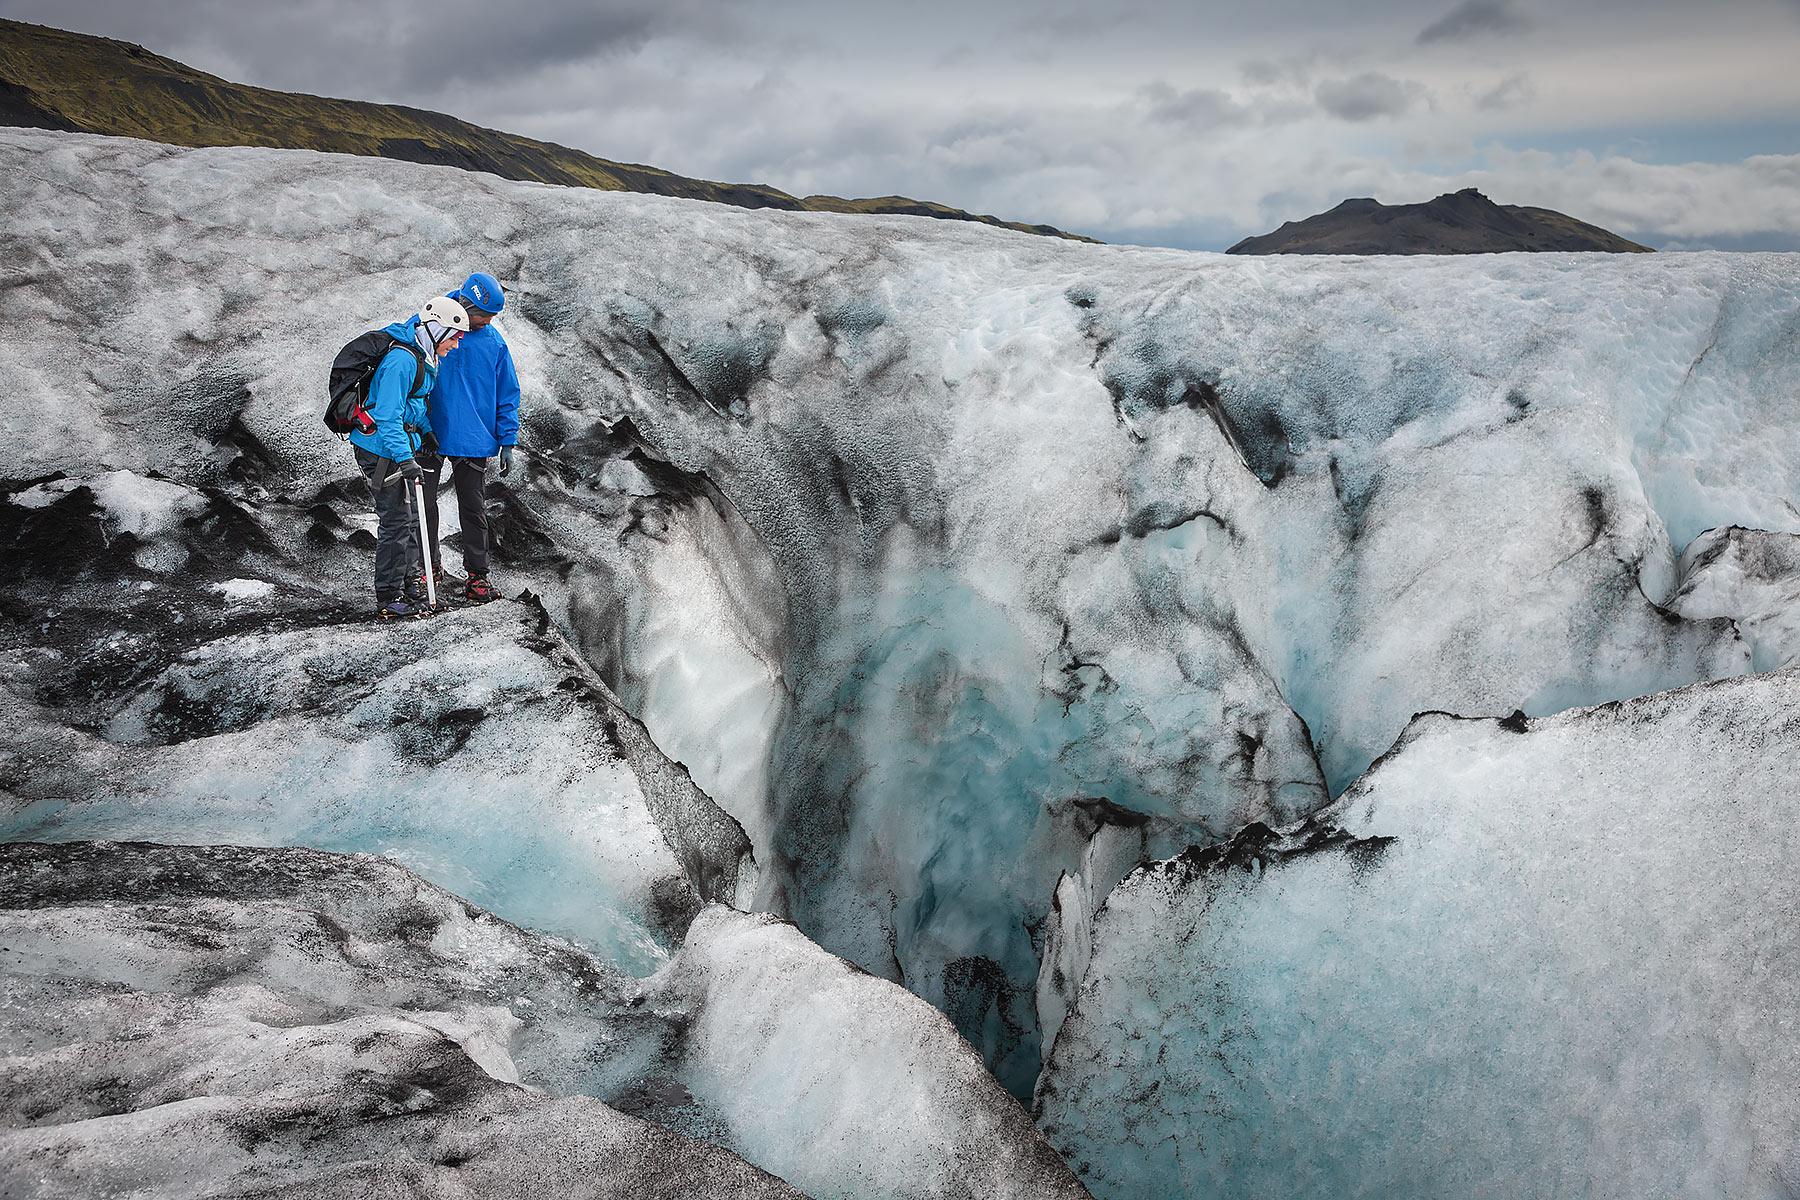 glacierwalk.jpg